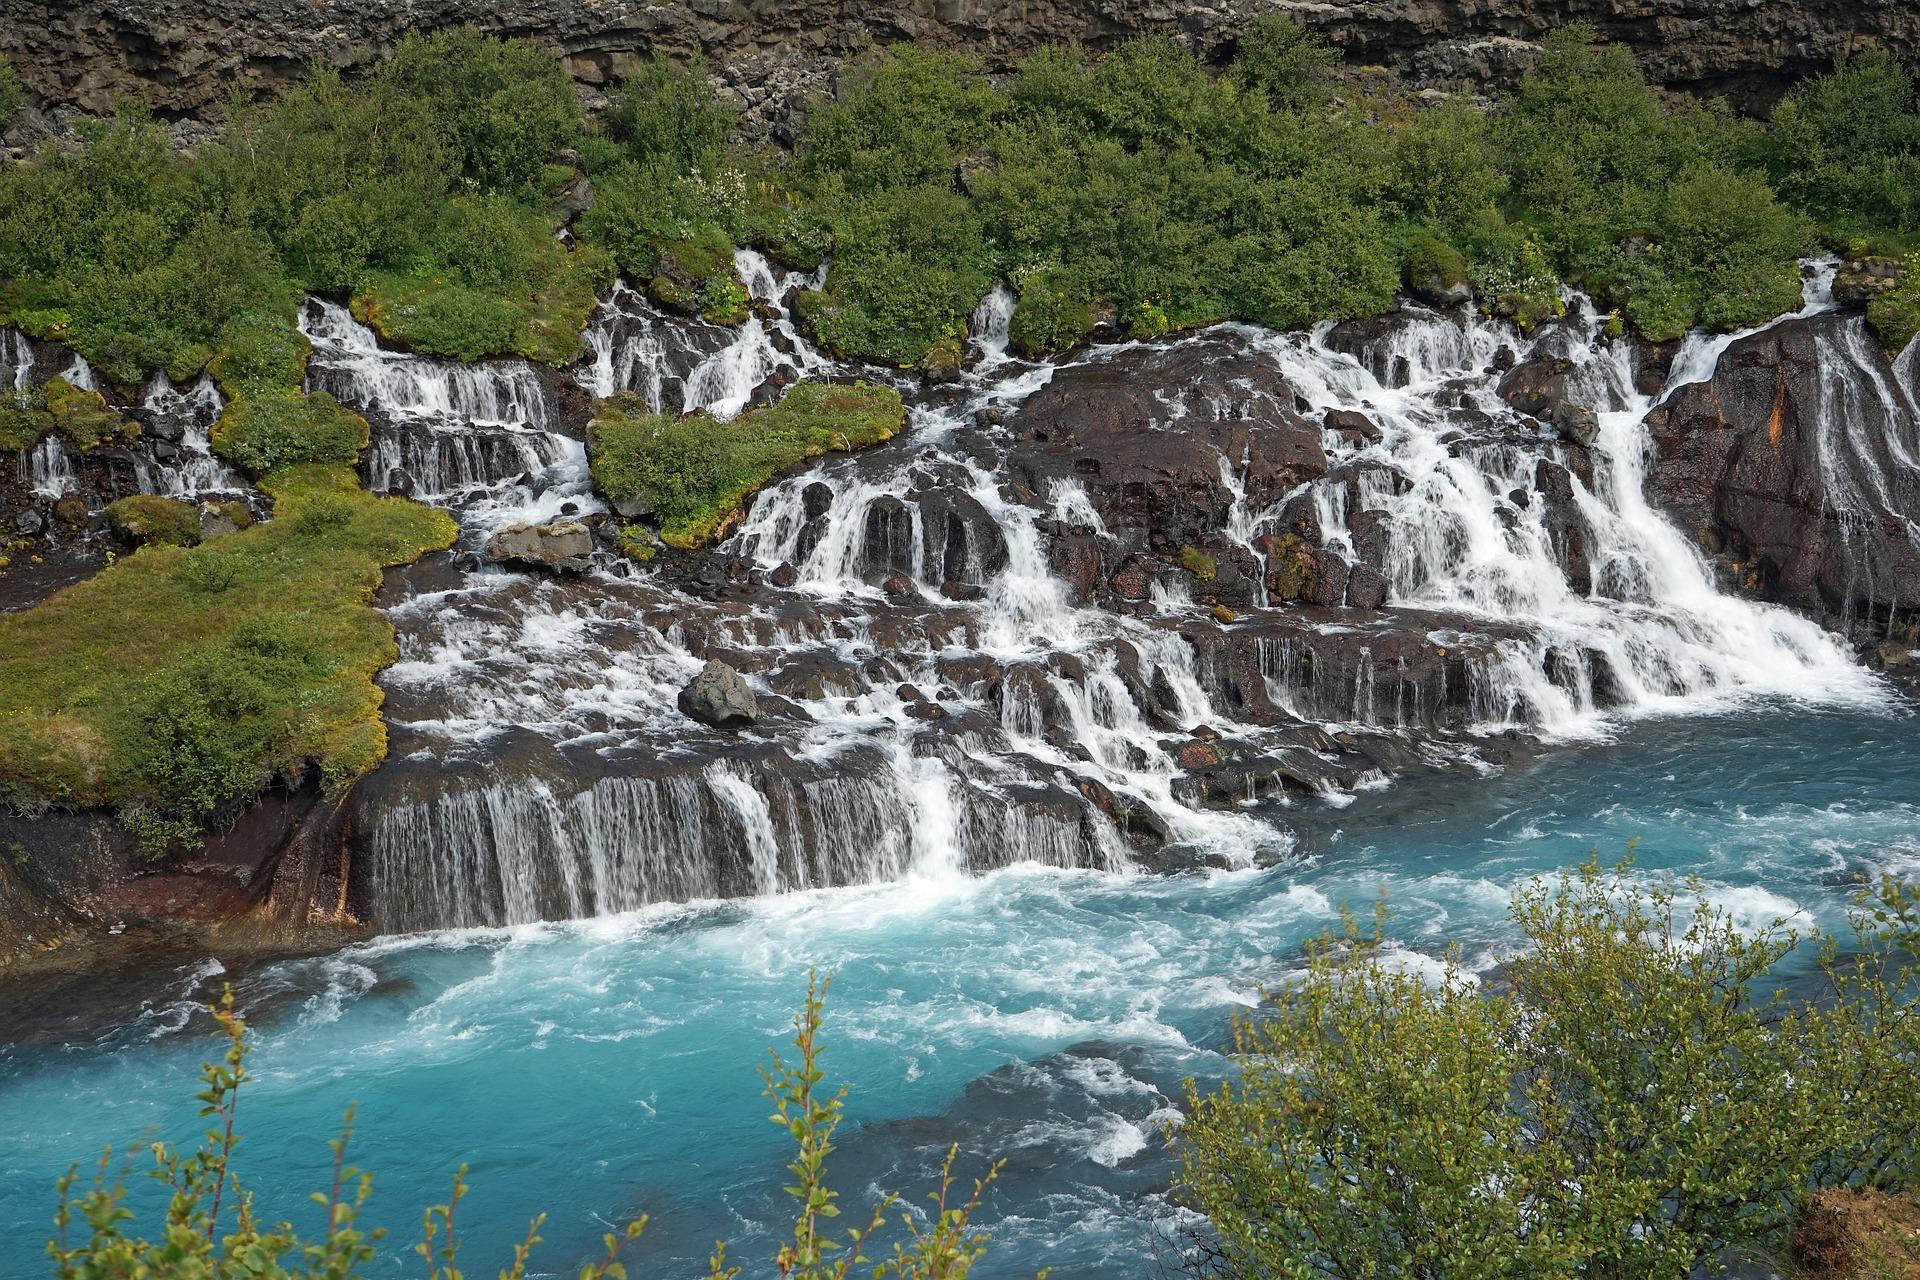 waterfall-889693_1920.jpg